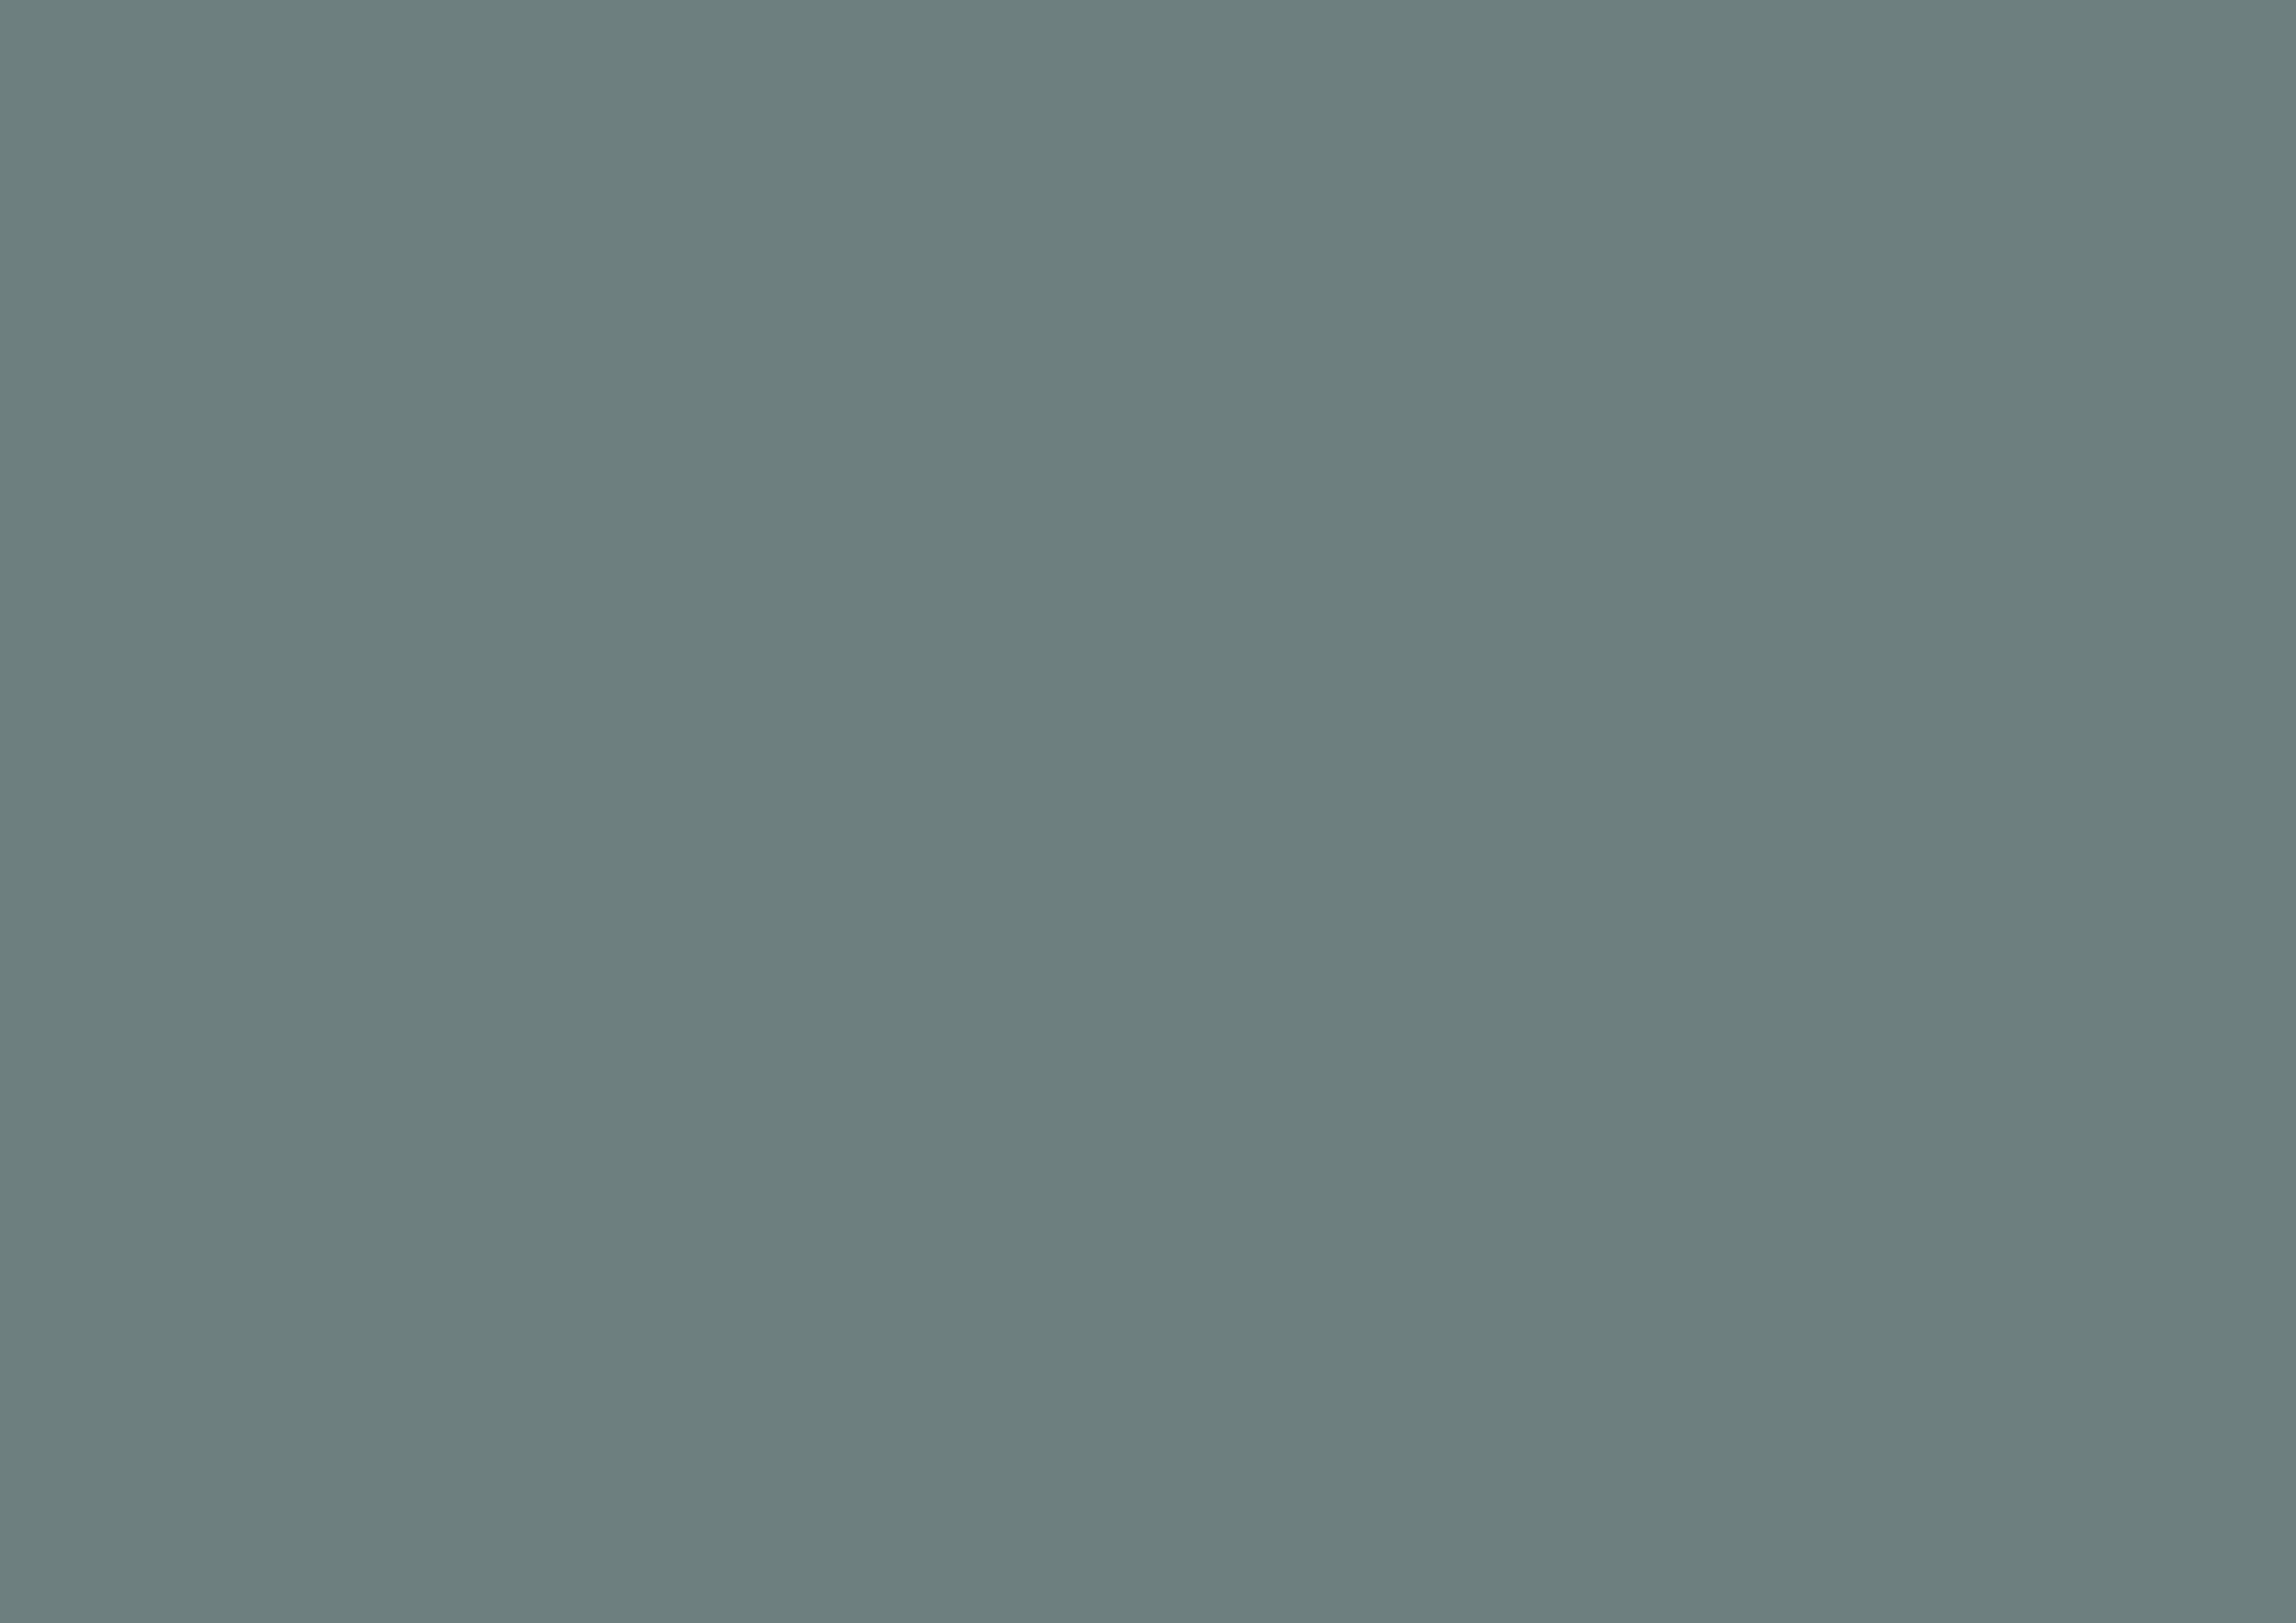 3508x2480 AuroMetalSaurus Solid Color Background